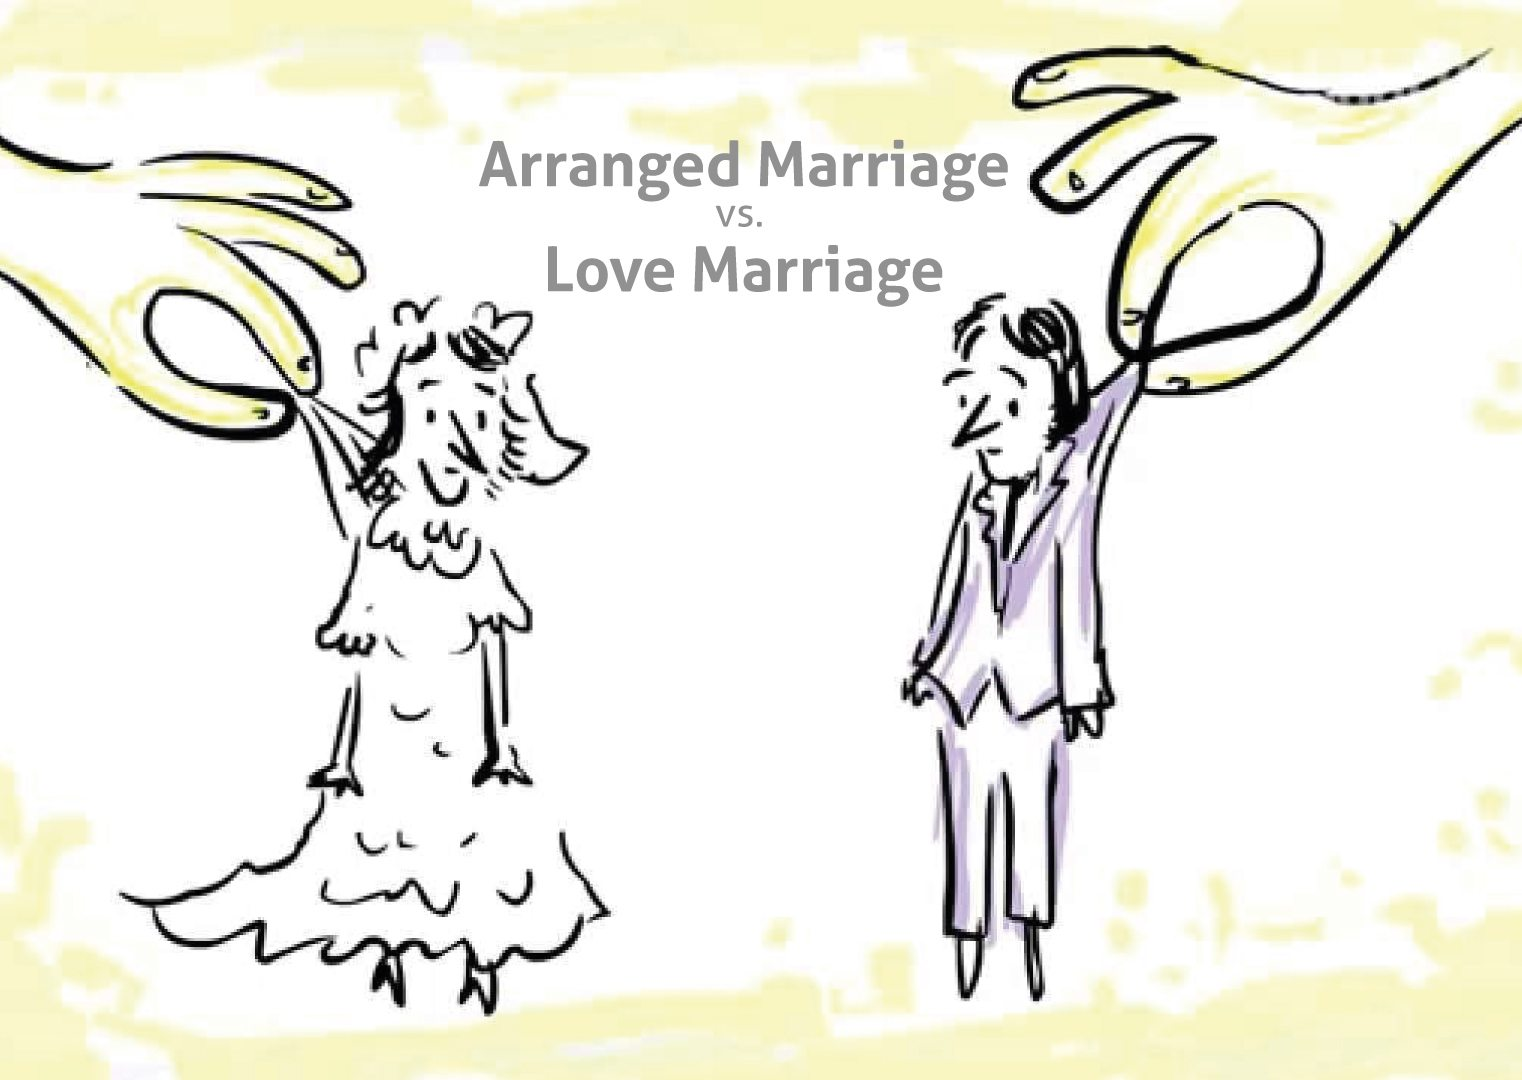 Arrange Marriage - In India It Is Karmic Destiny - YourDOST Blog